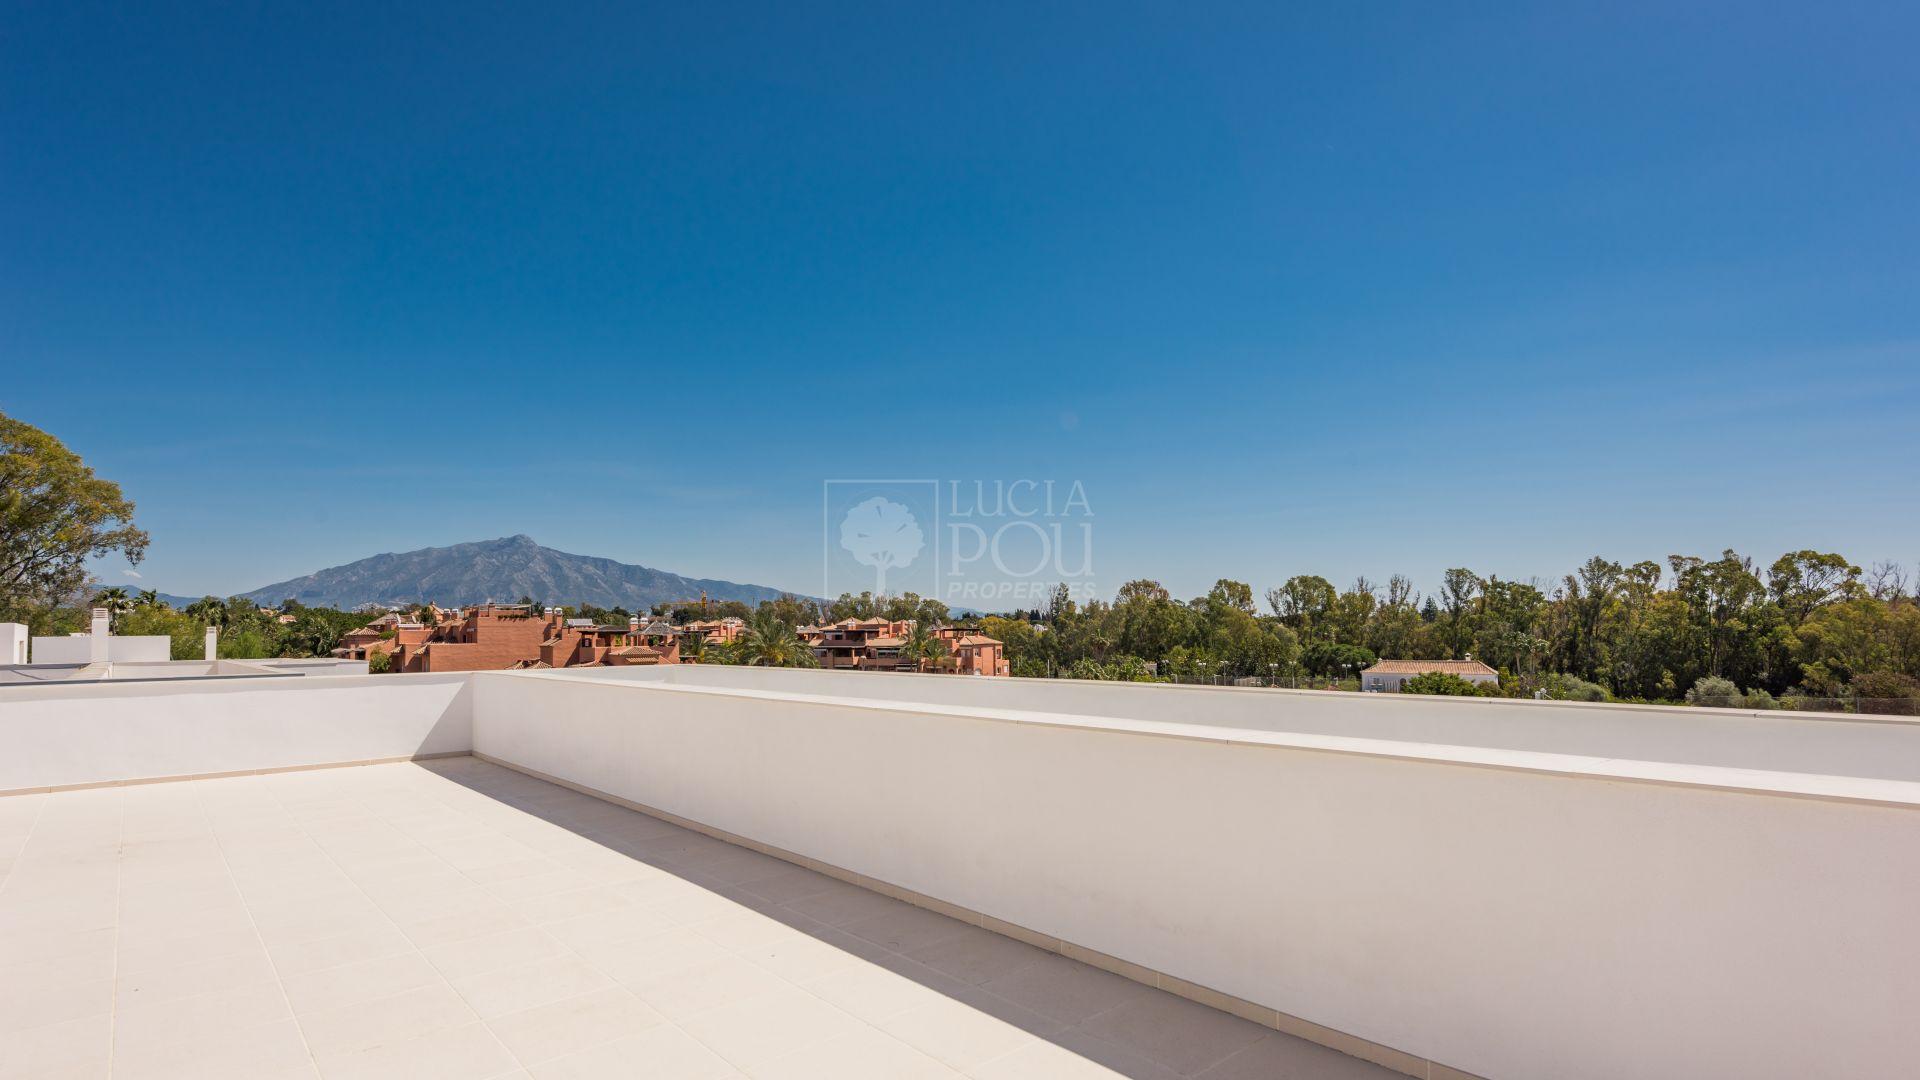 Development in Casasola, Estepona